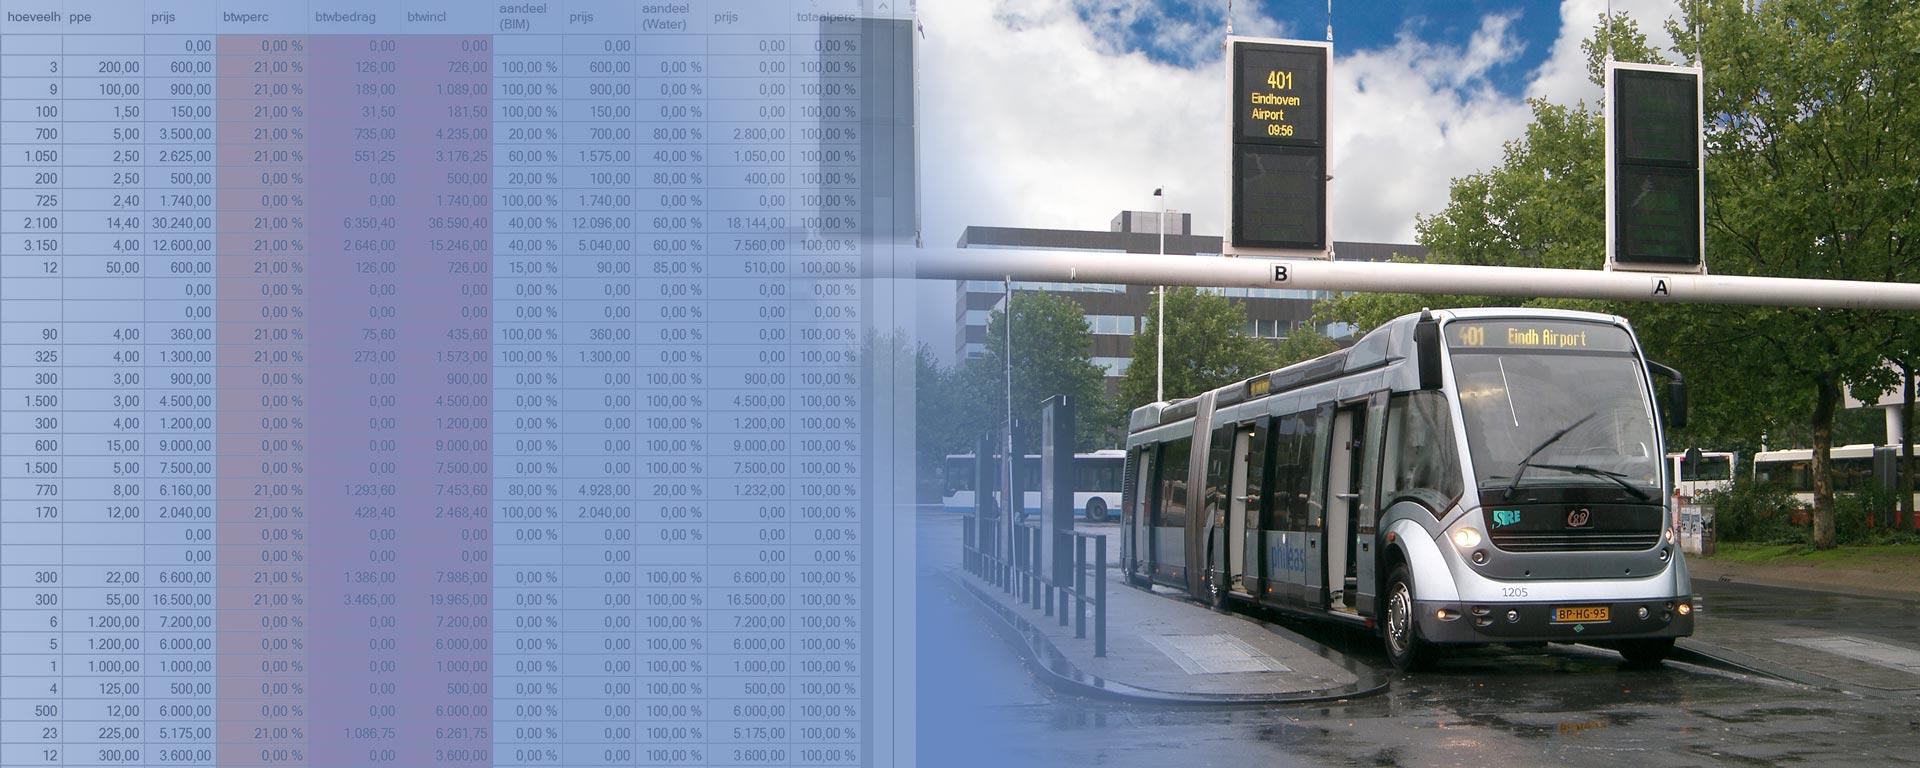 Kostenramingen Eindhoven HOV3-tracé